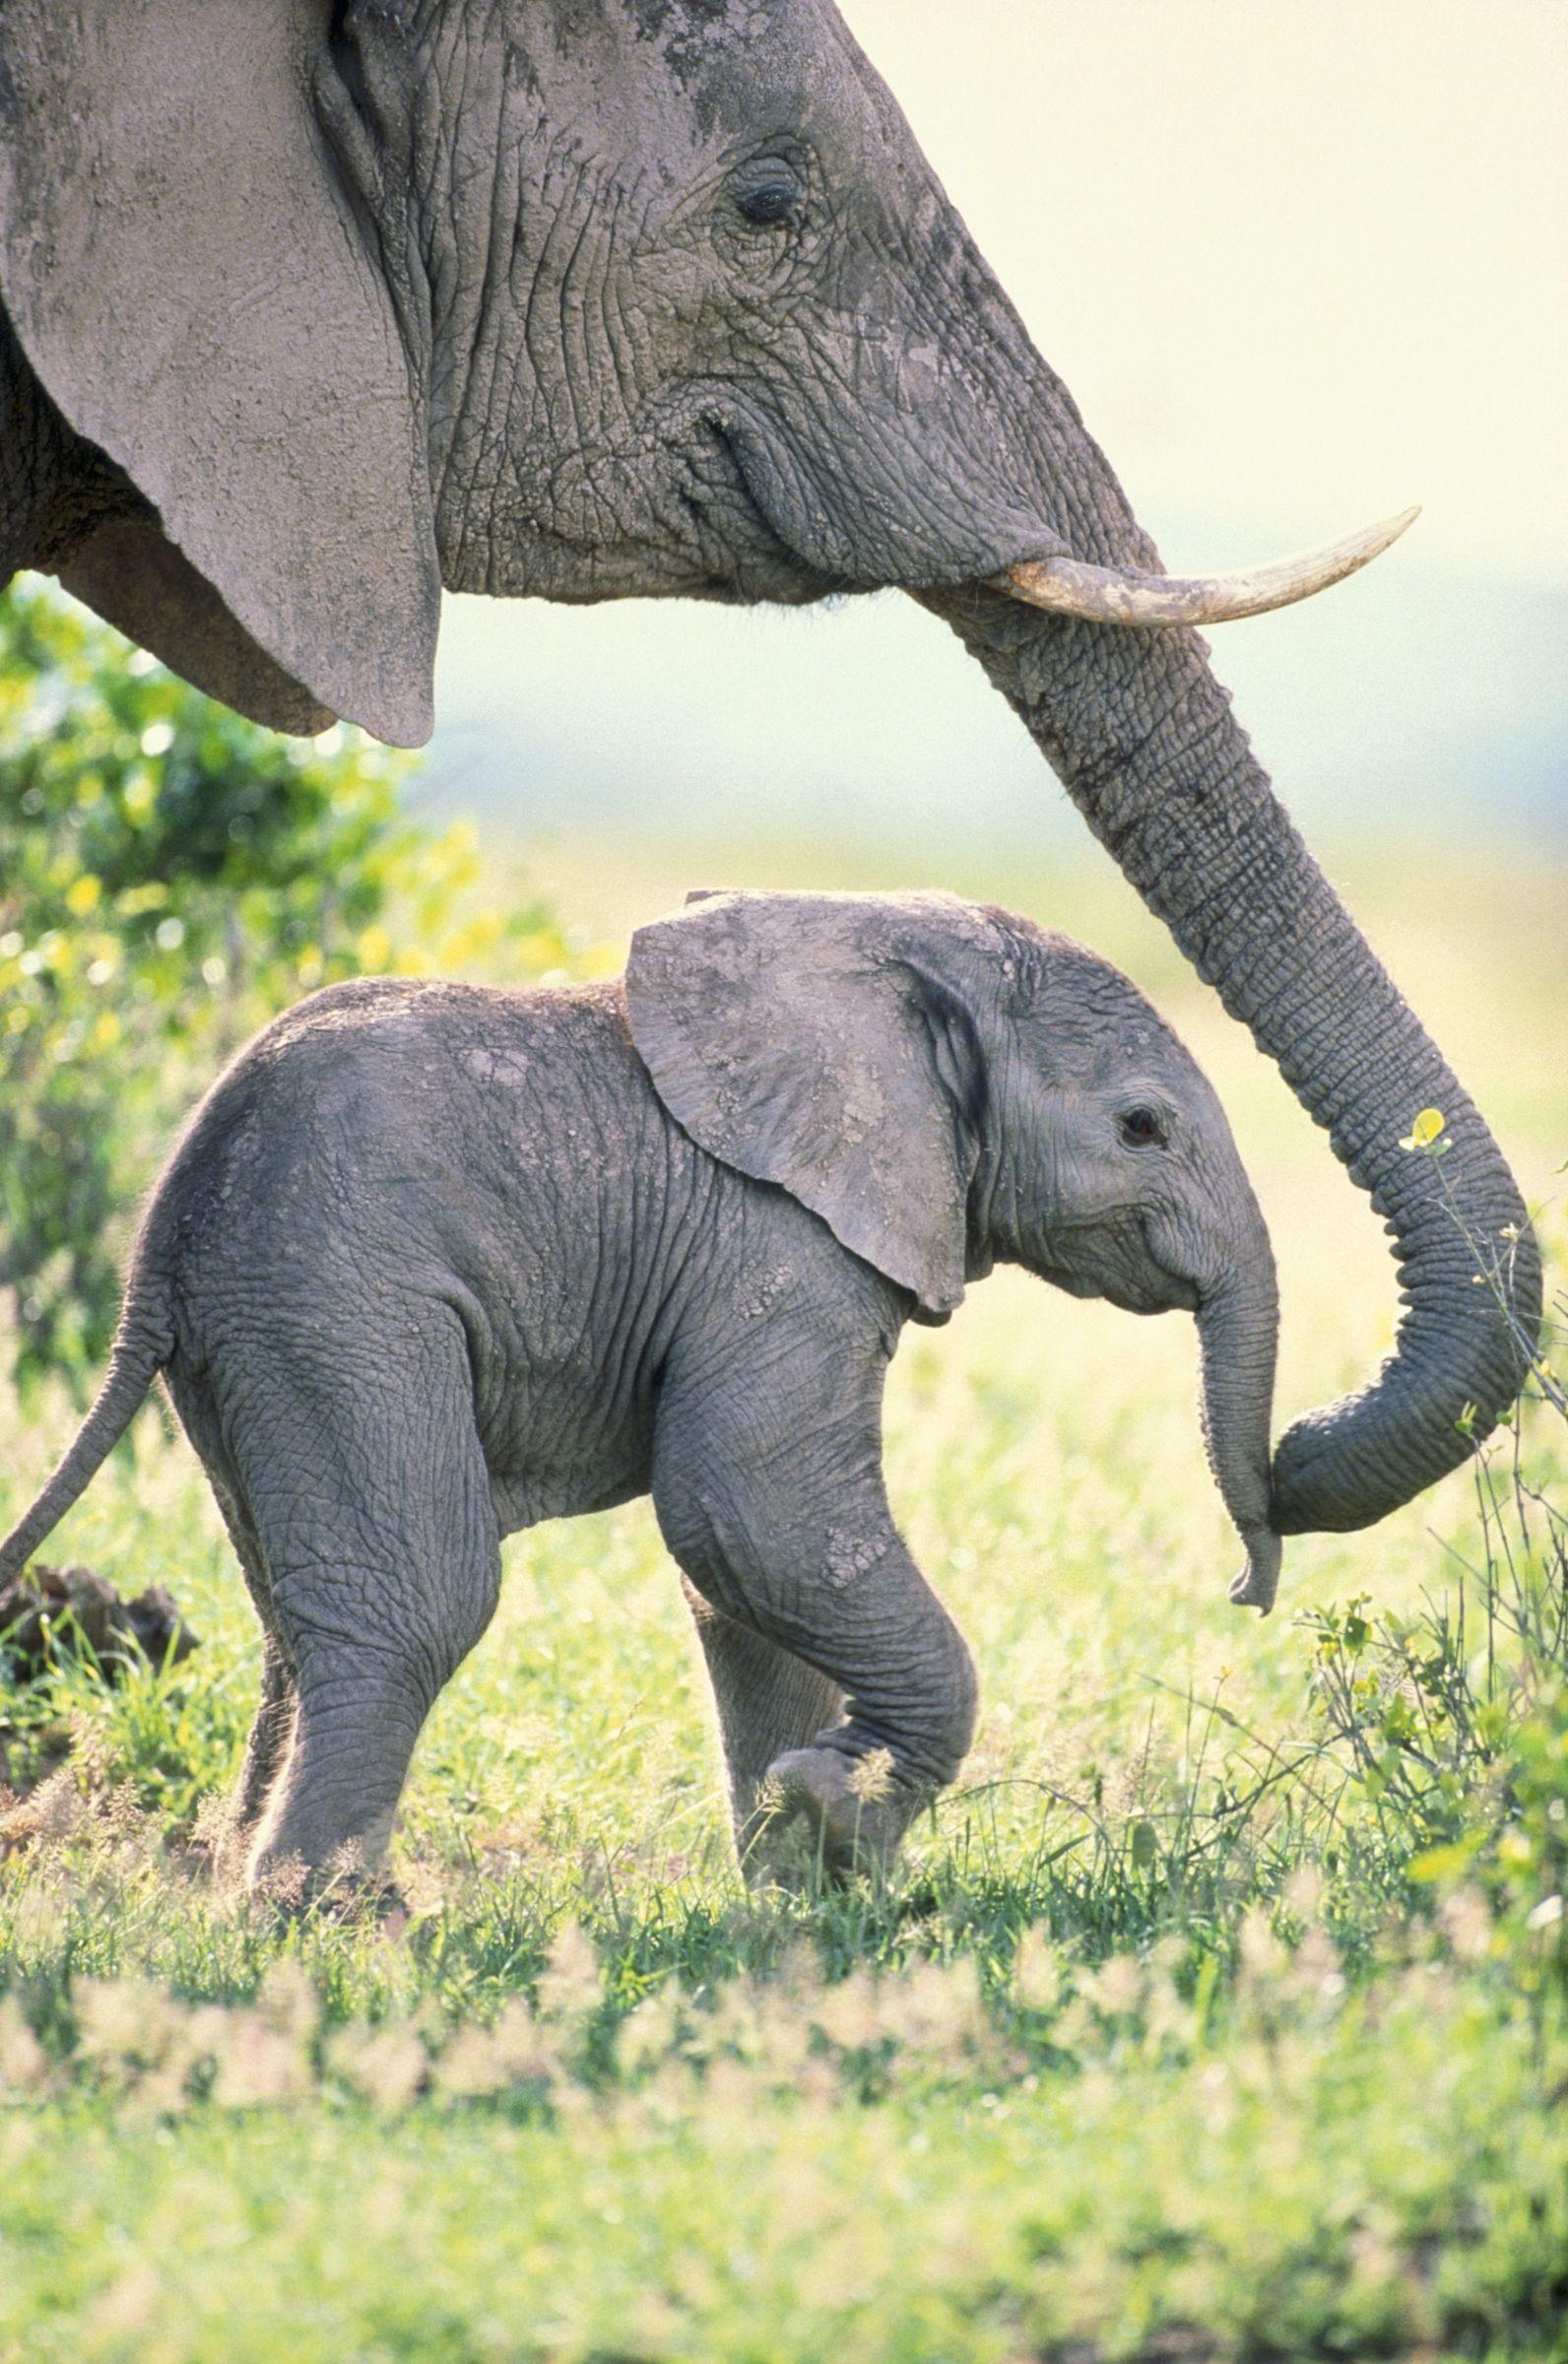 African Elephant Cow and Calf, Amboseli National Park, Kenya